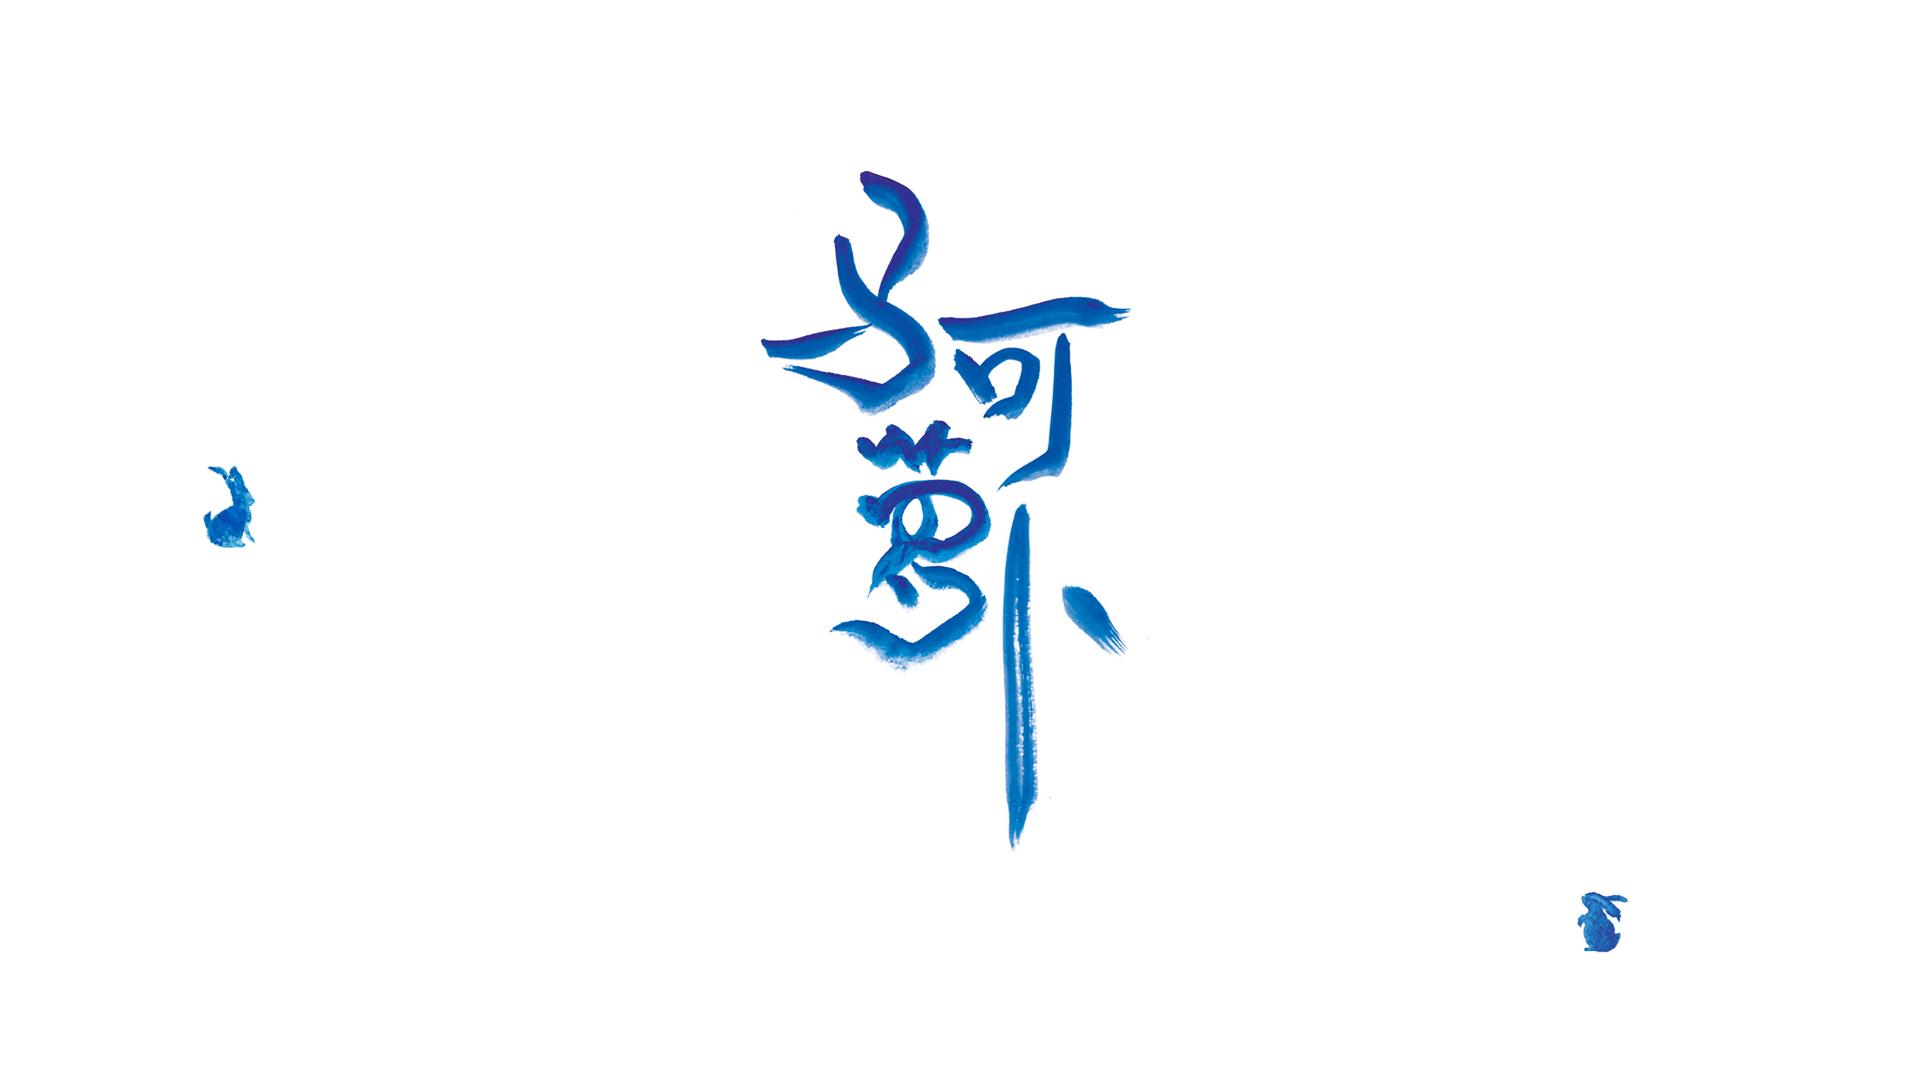 Hummingbird _ Motif - Dawn Wong & The Ark Royal Marco Lopo Album